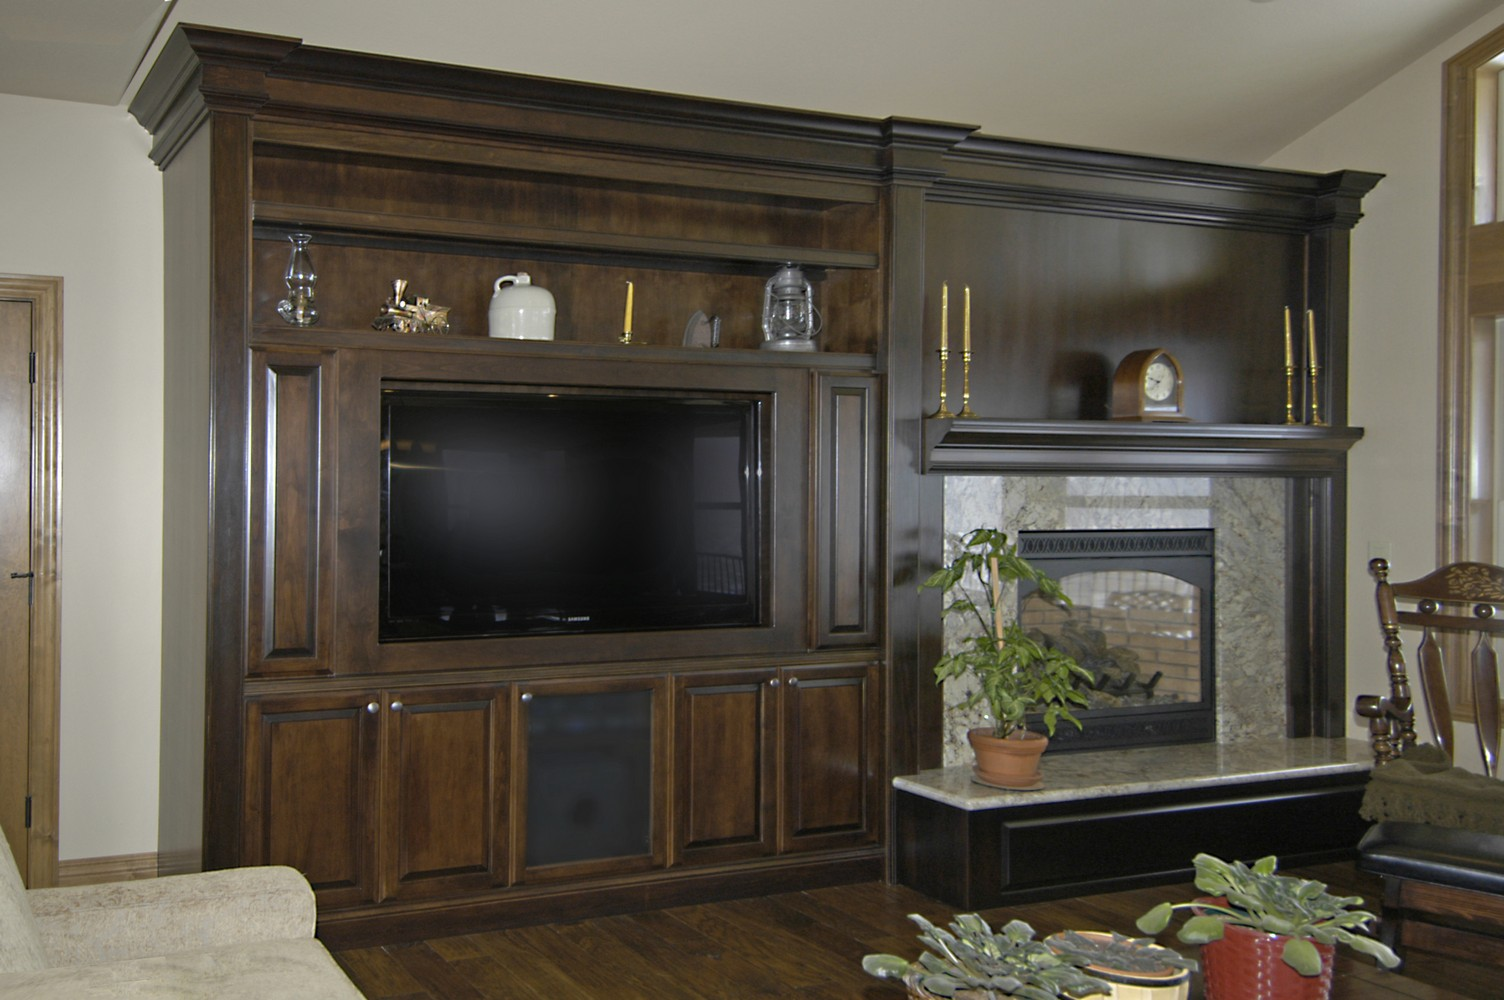 TV Media Cabinetry